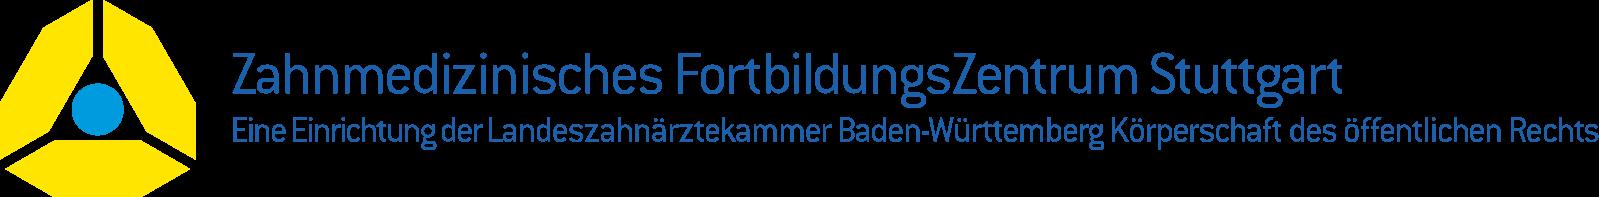 ZFZ-Stuttgart-Zahnmedizin-Fortbildung-Logo-3